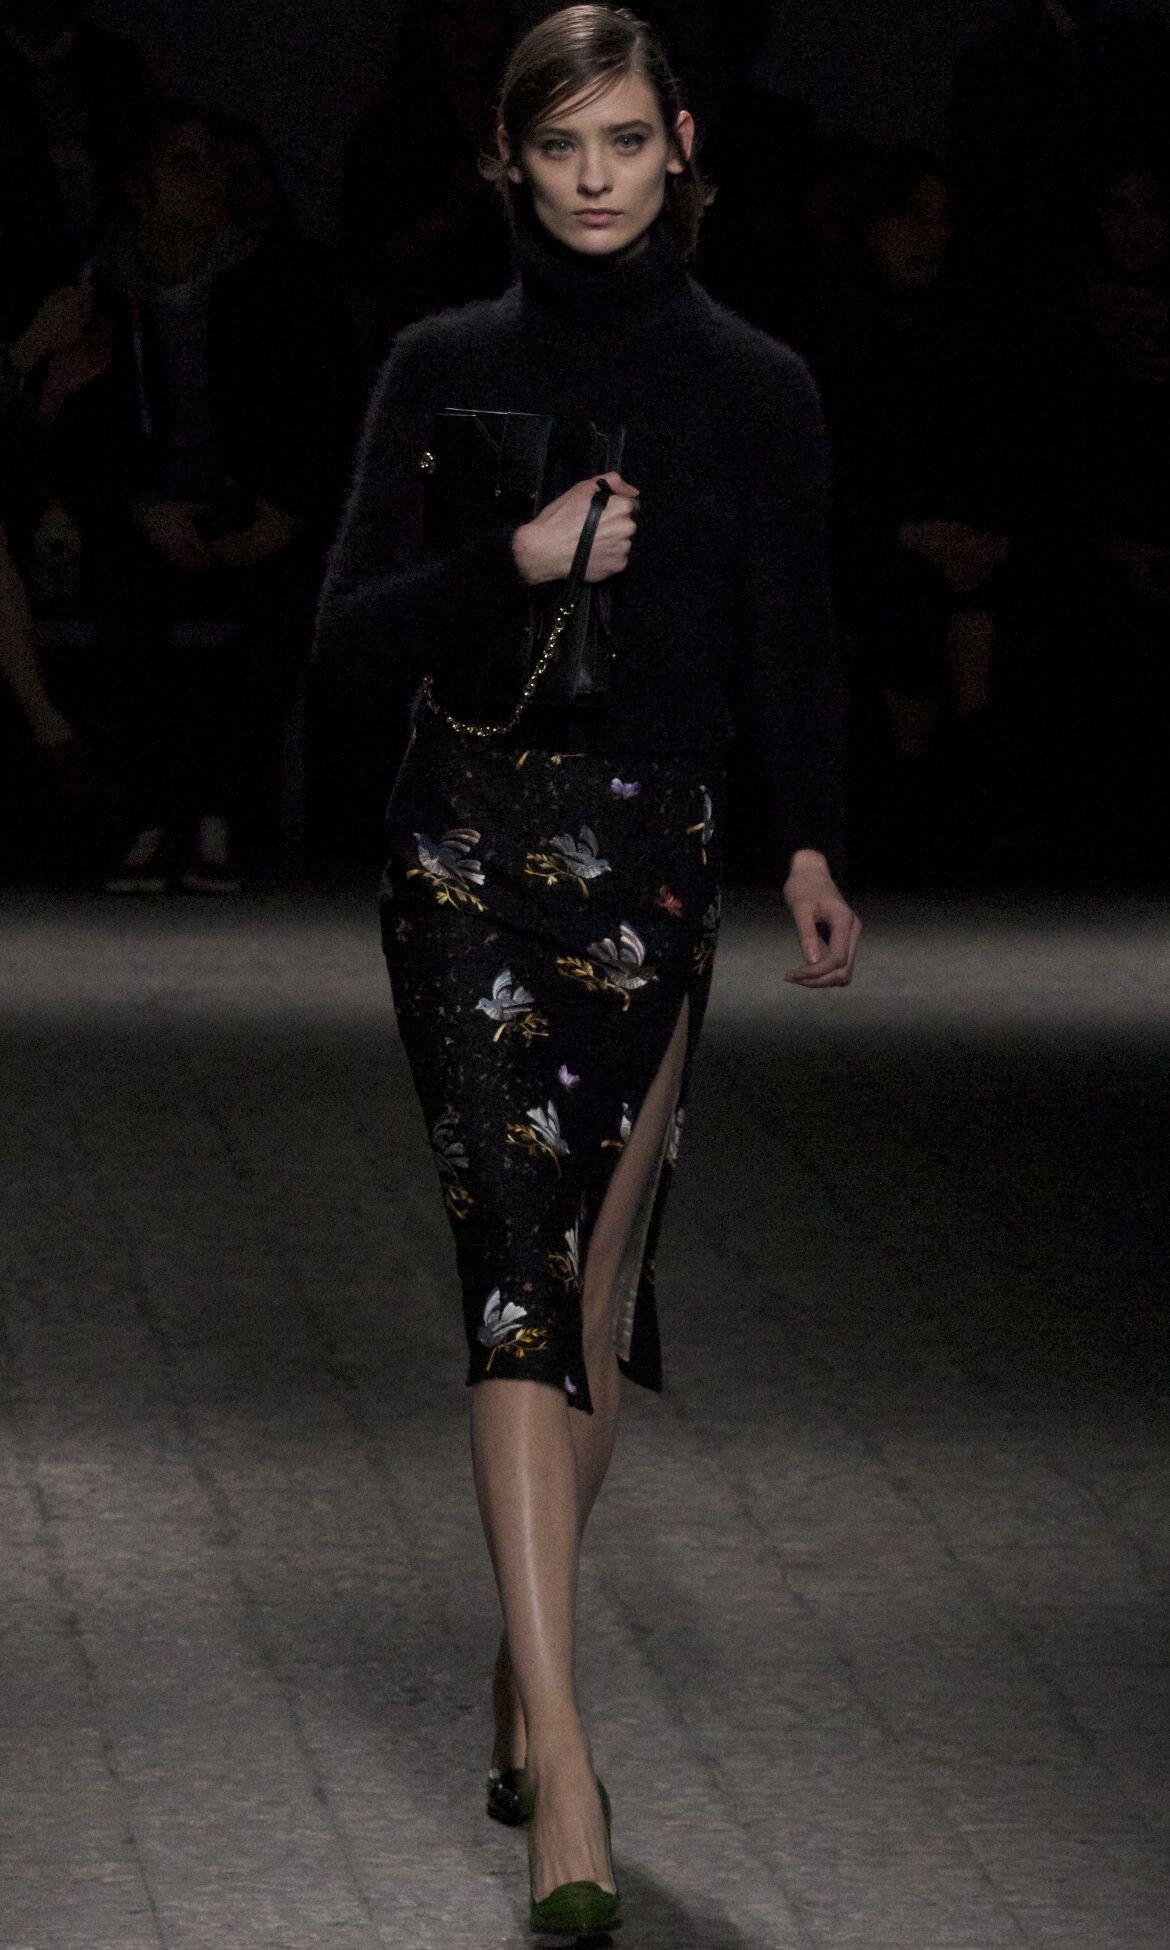 Winter Fashion Trends 2013 N°21